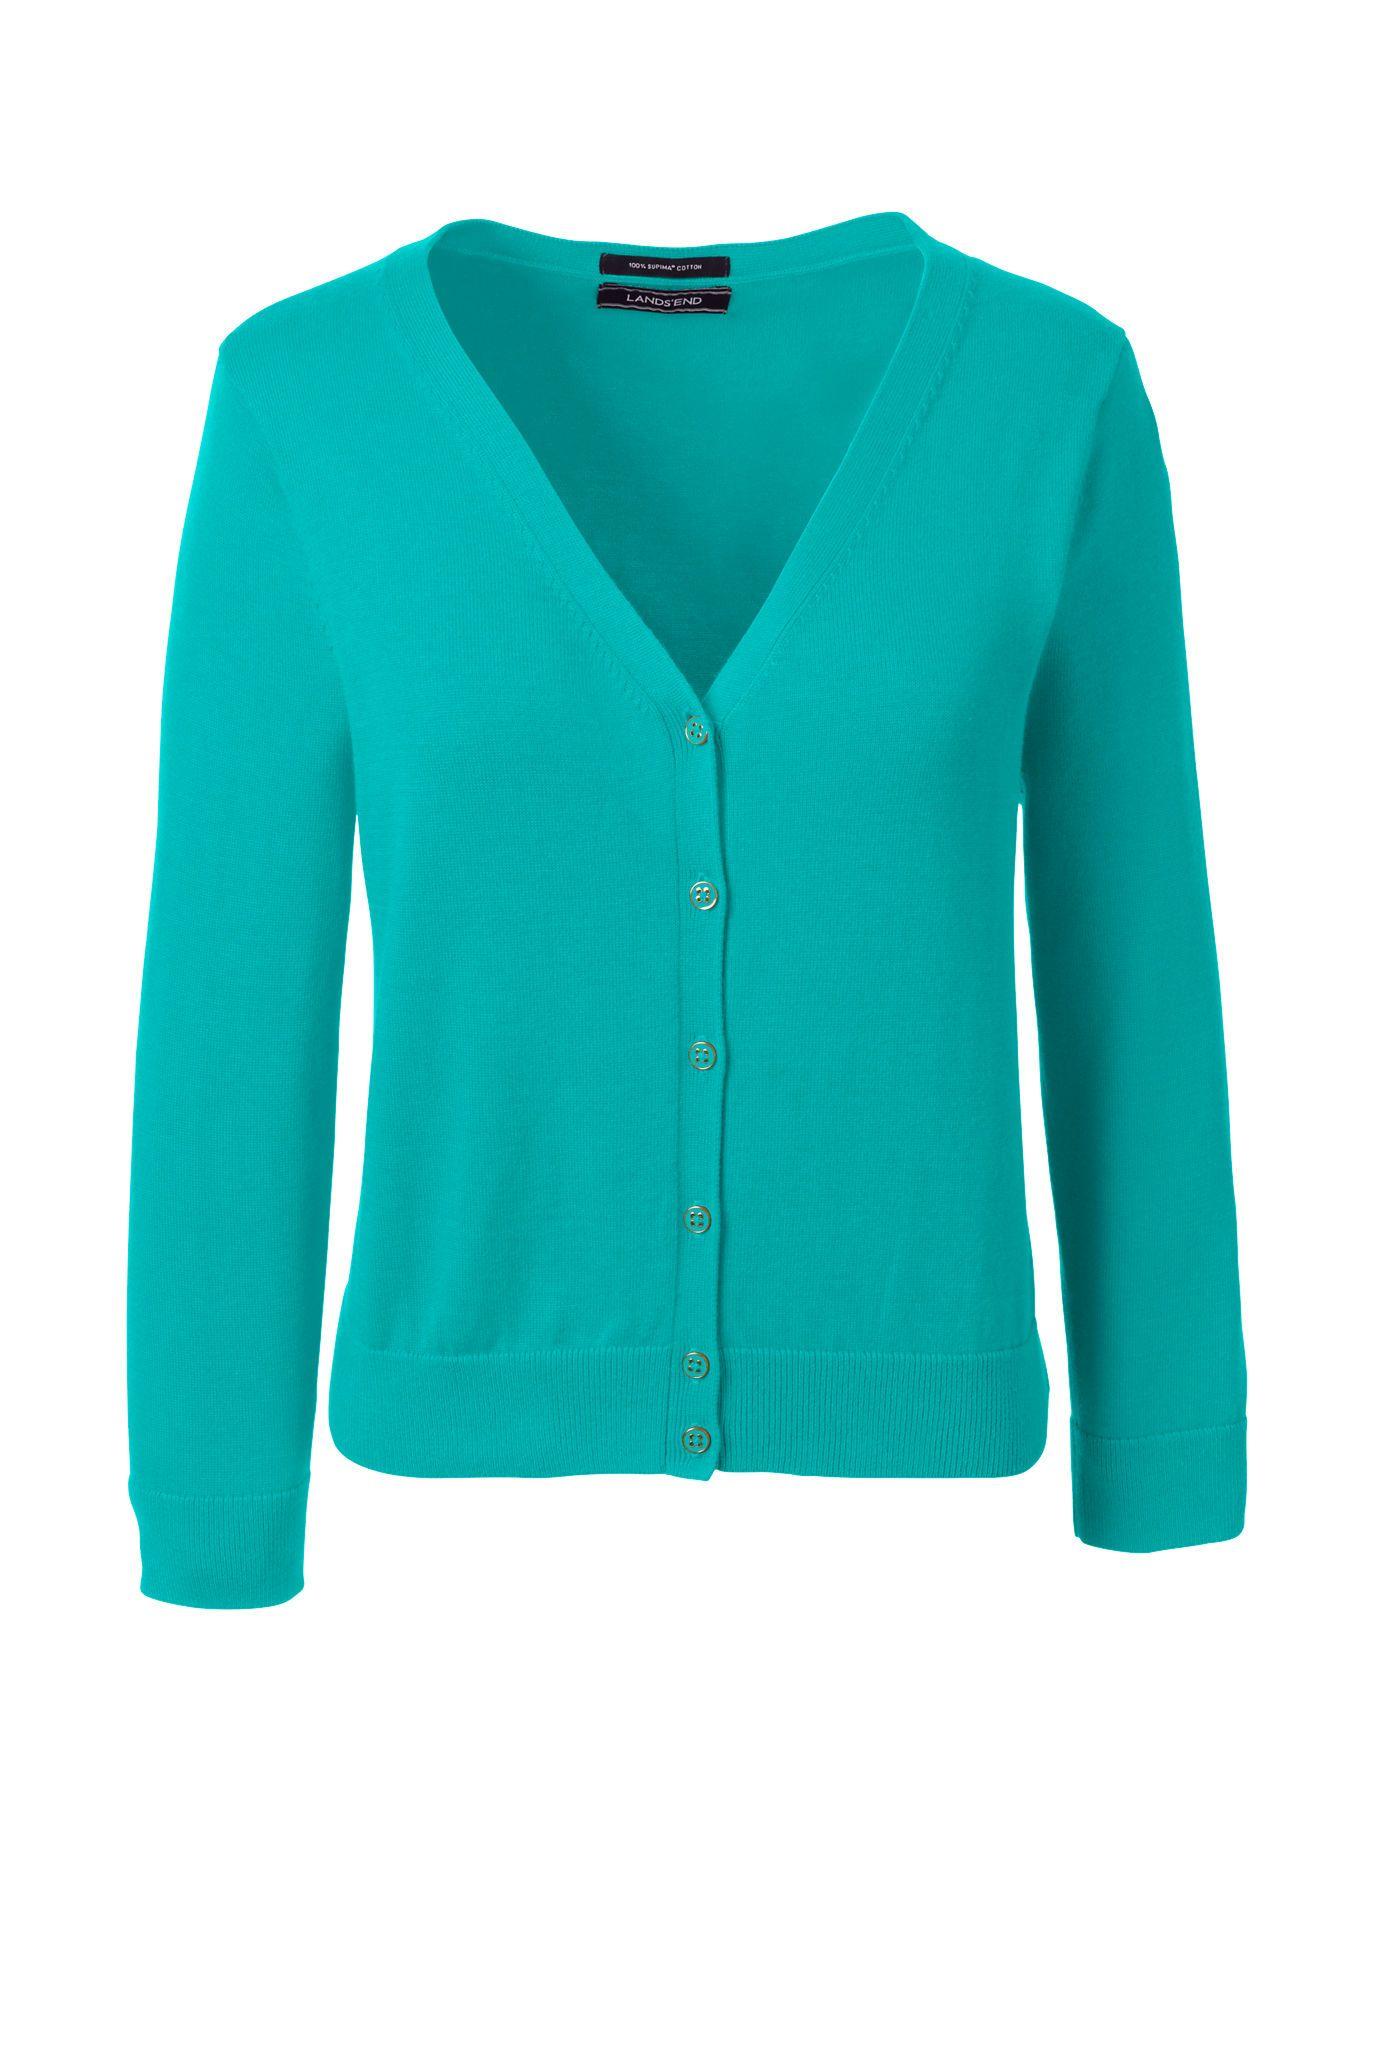 Women's 3/4 Sleeve Supima Dress Cardigan Sweater | CLOTHES, ETC ...